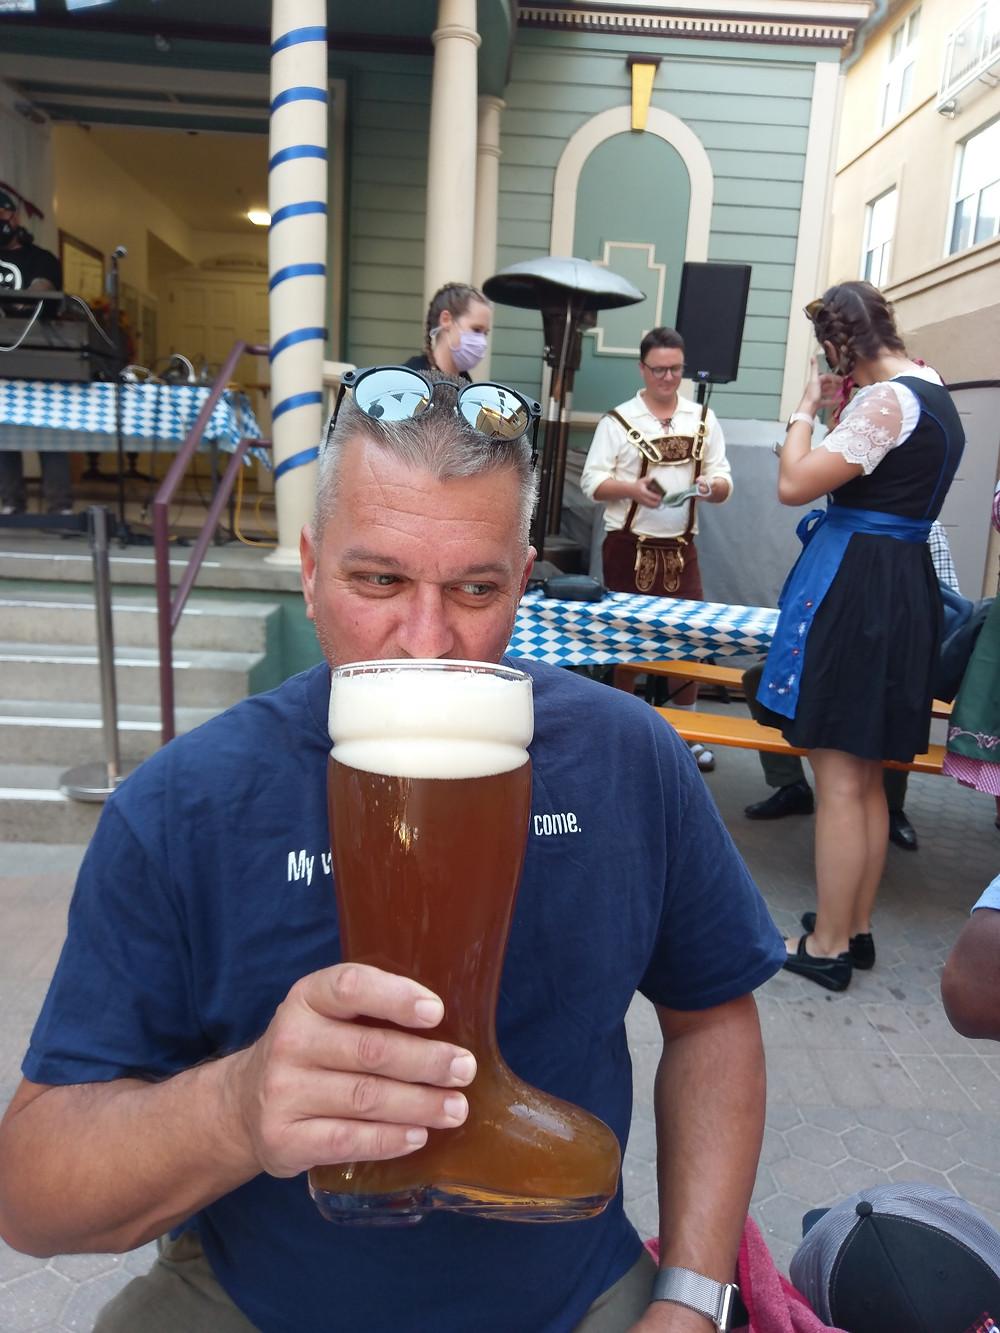 covid oktoberfest safety, wearing masks, drinking beer, san jose, california